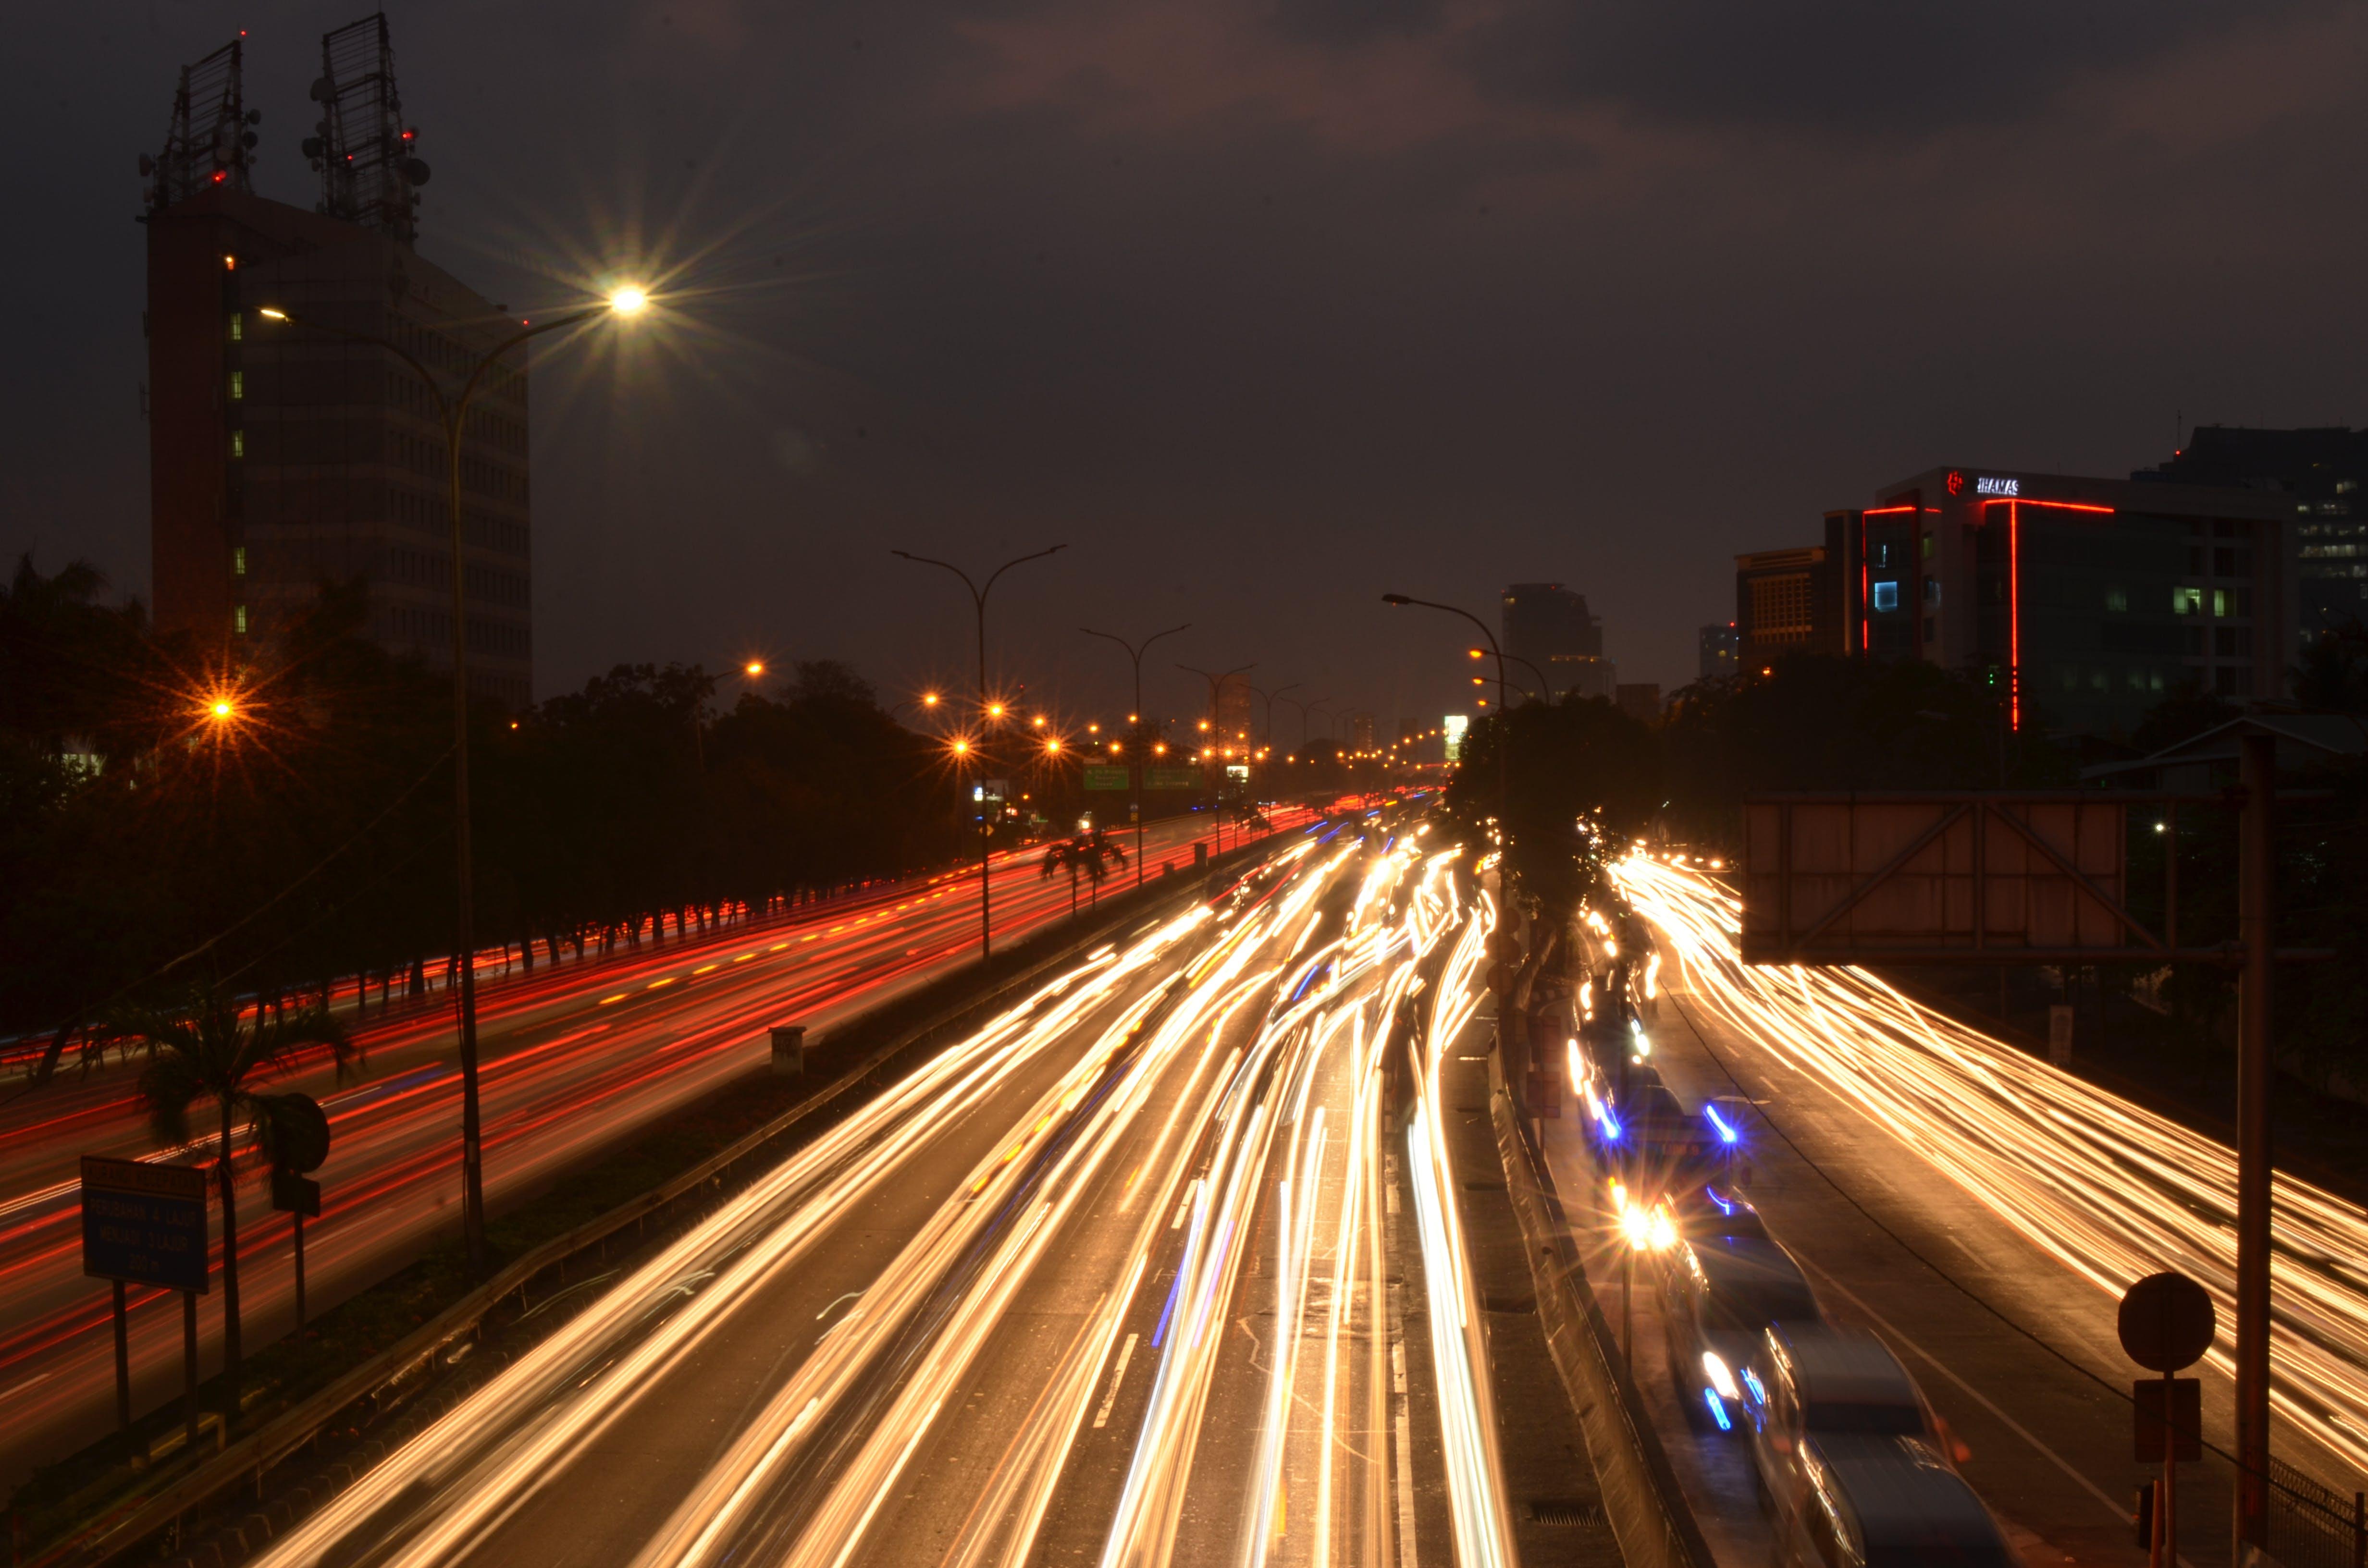 Free stock photo of buildings, car lights, city, city lights